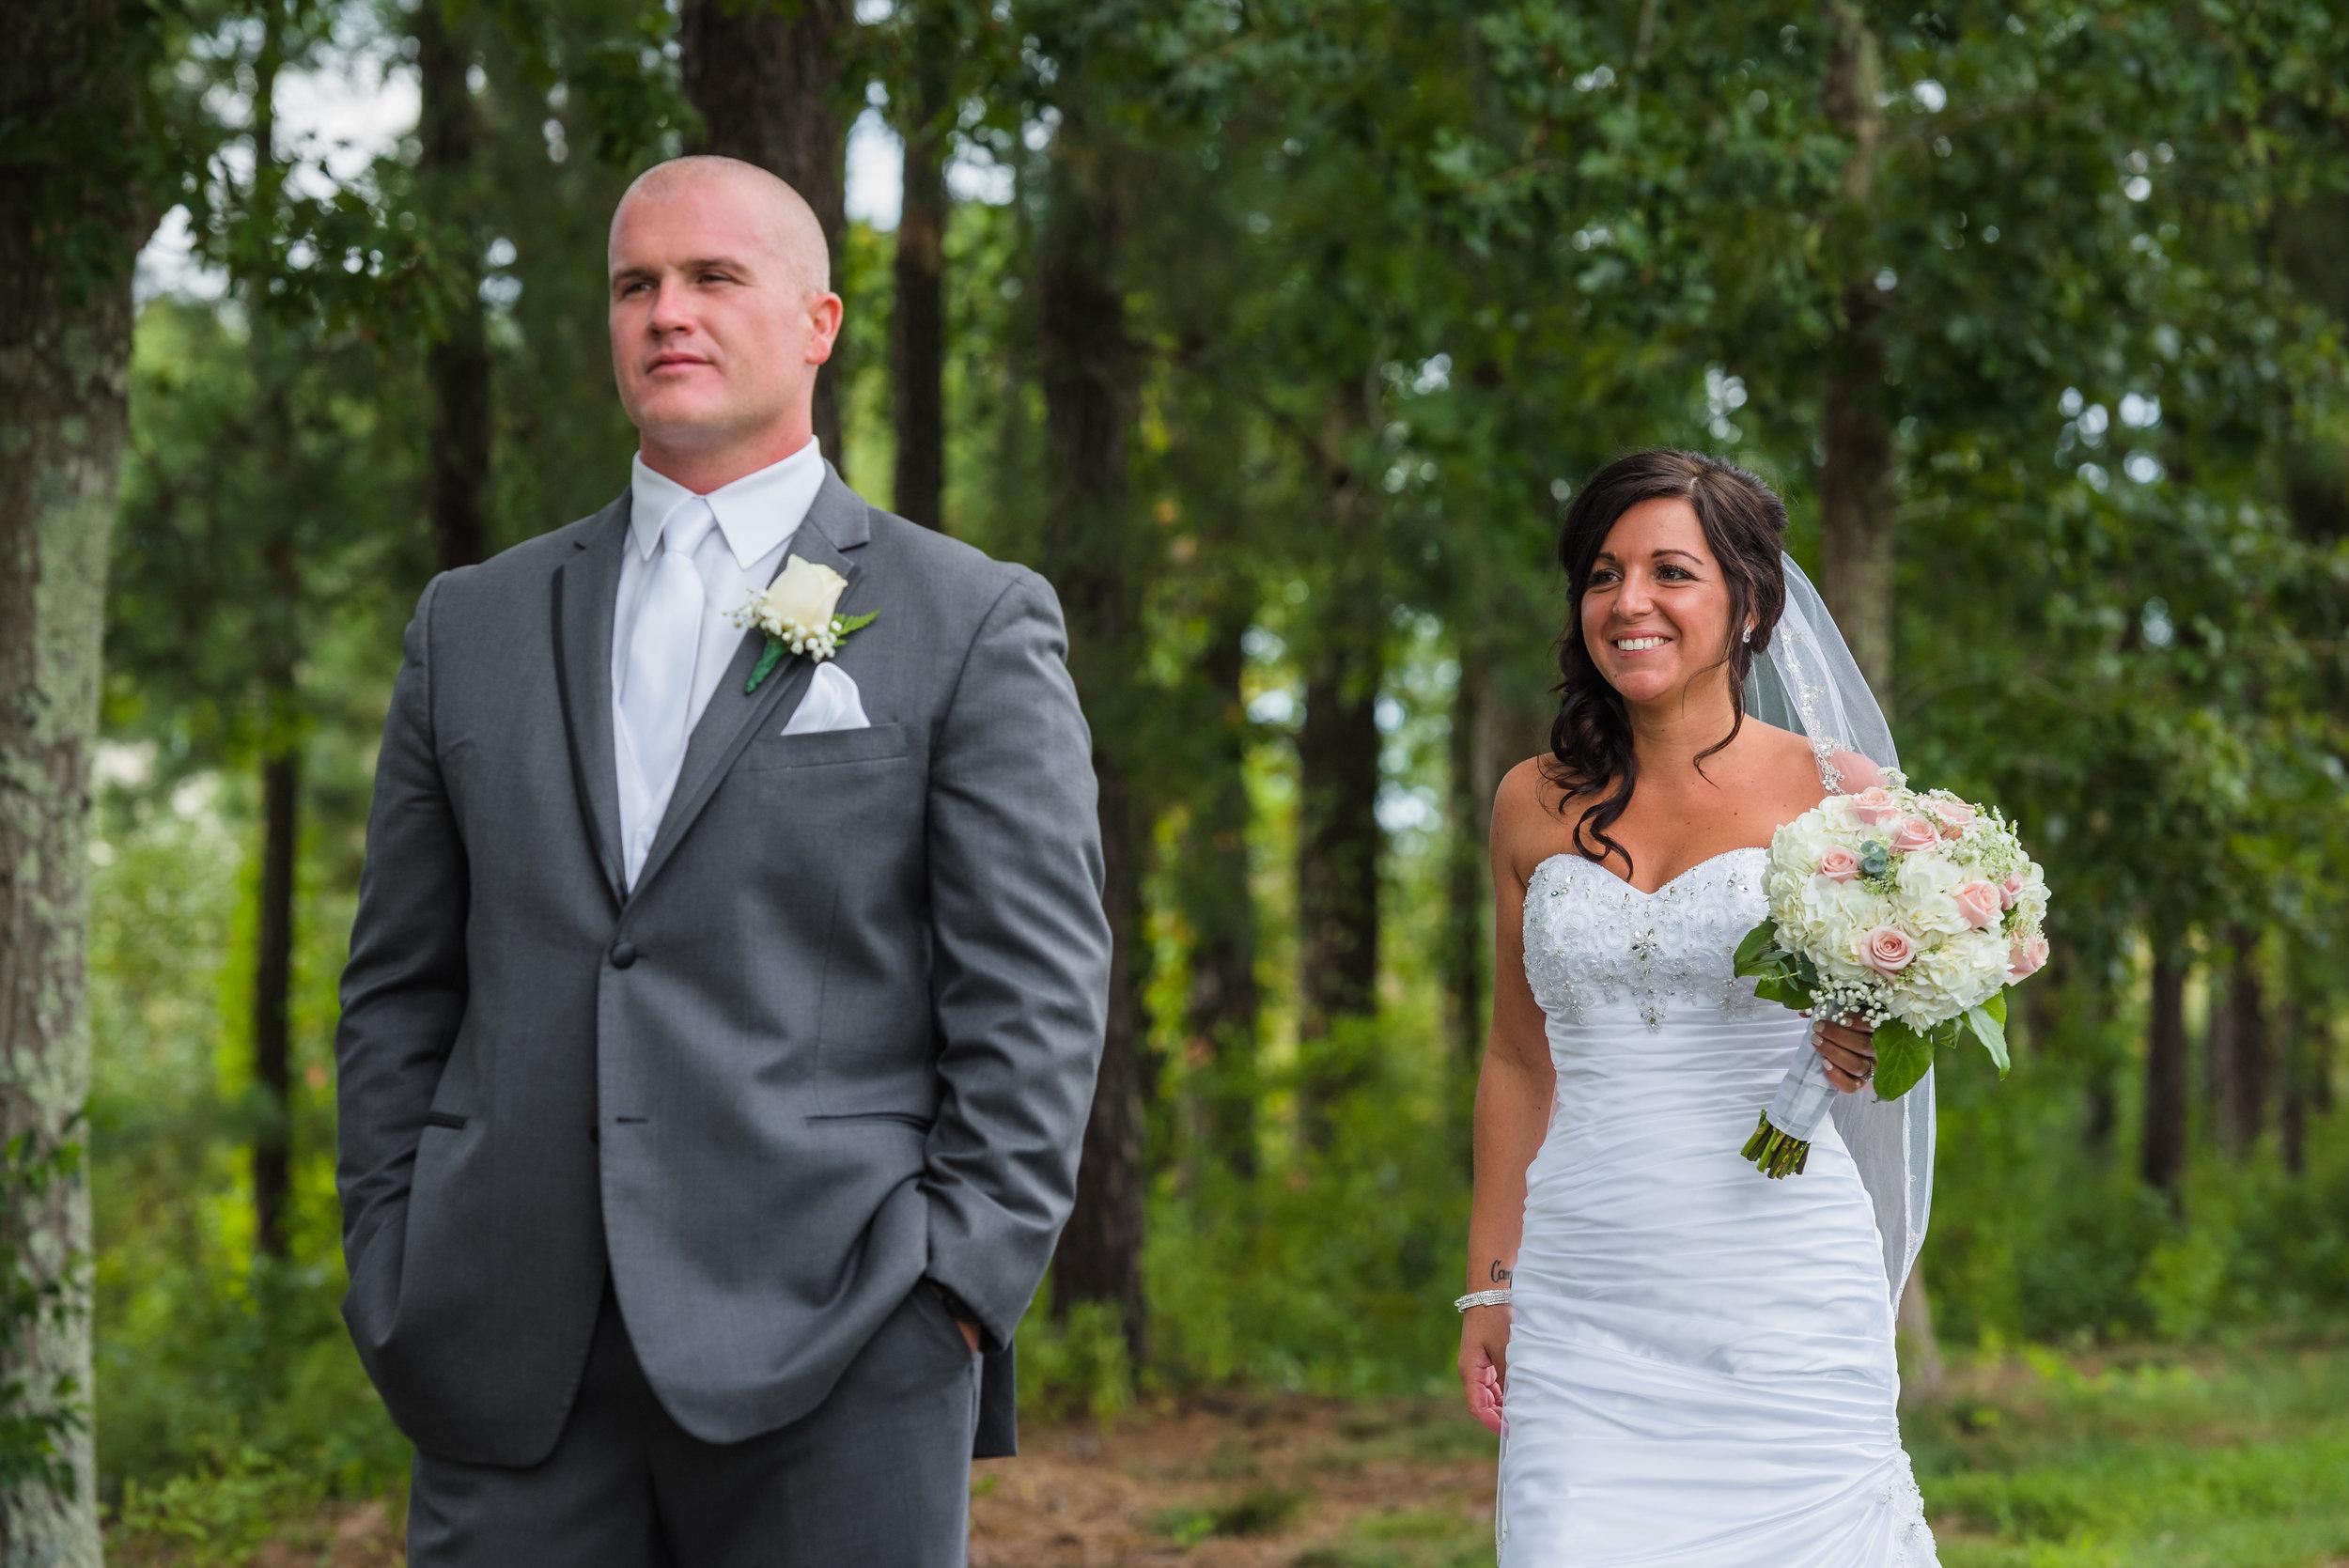 Seaoaks Wedding Photos Steph 14